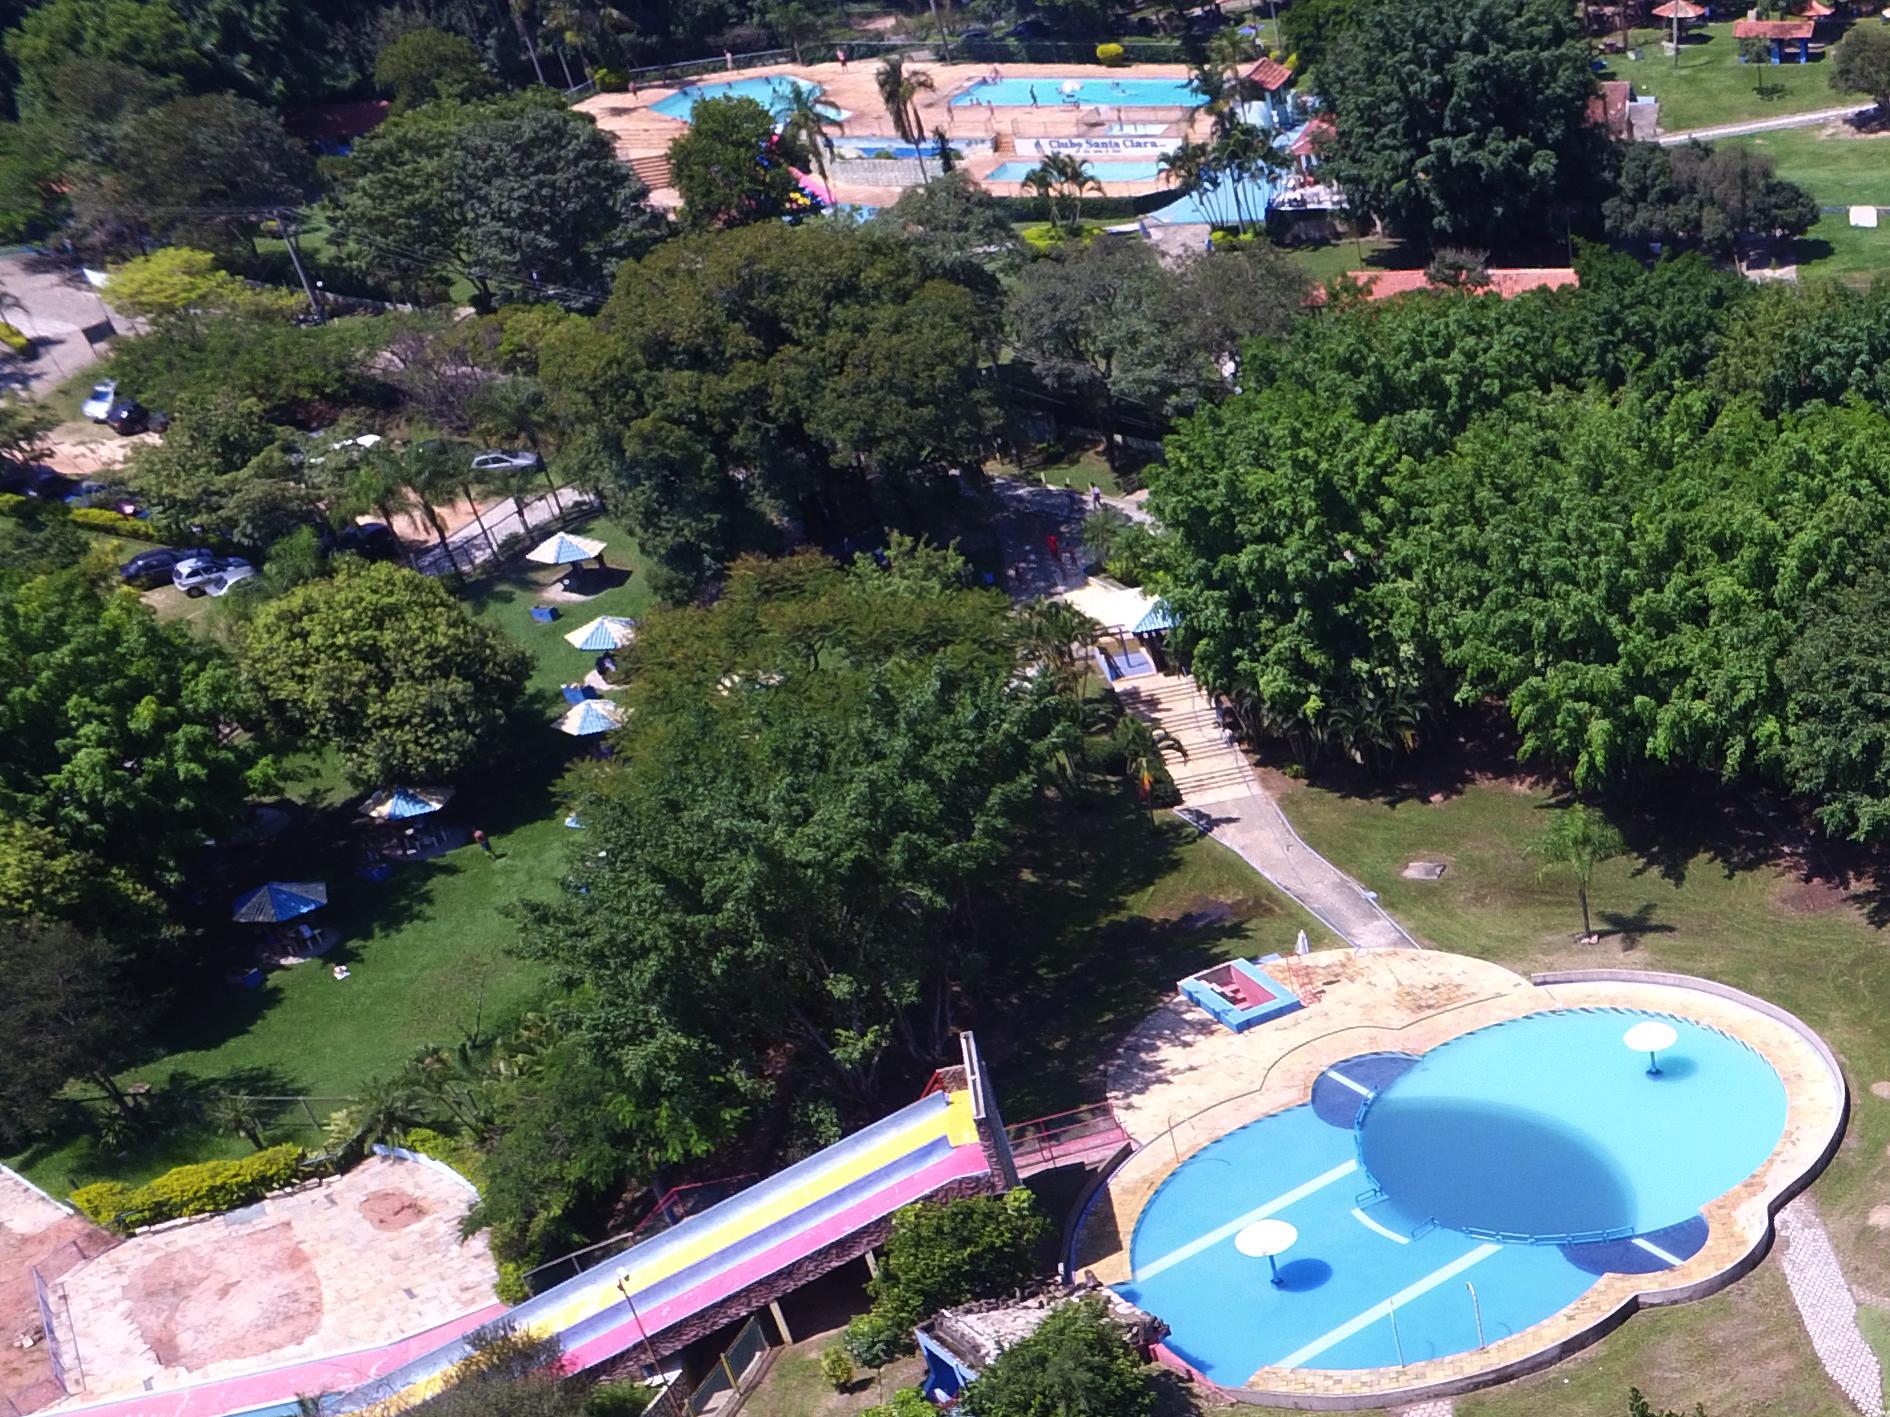 foto aerea parque 2